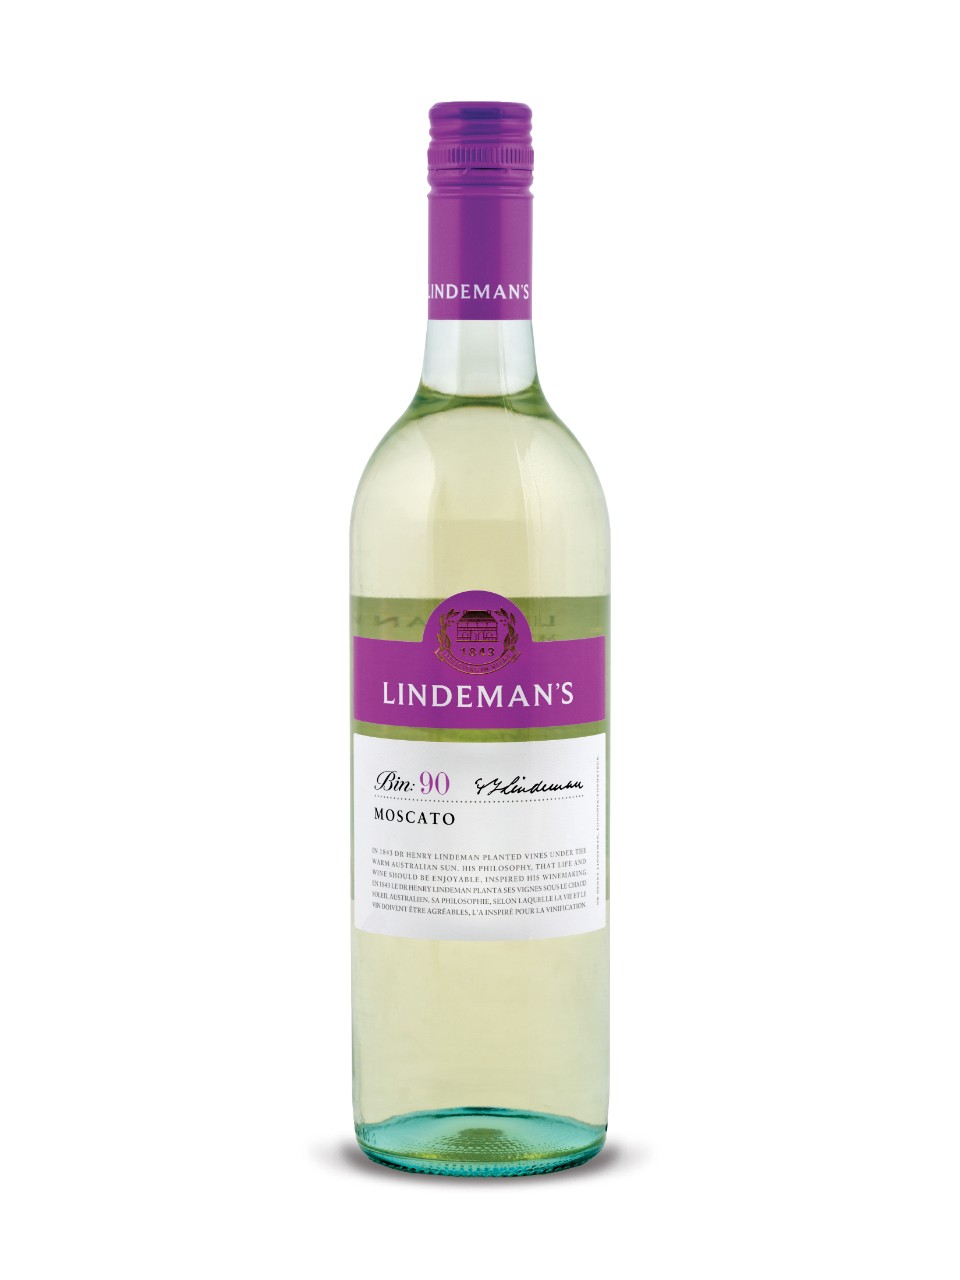 Lindeman's Bin 90 Moscato (750ml)